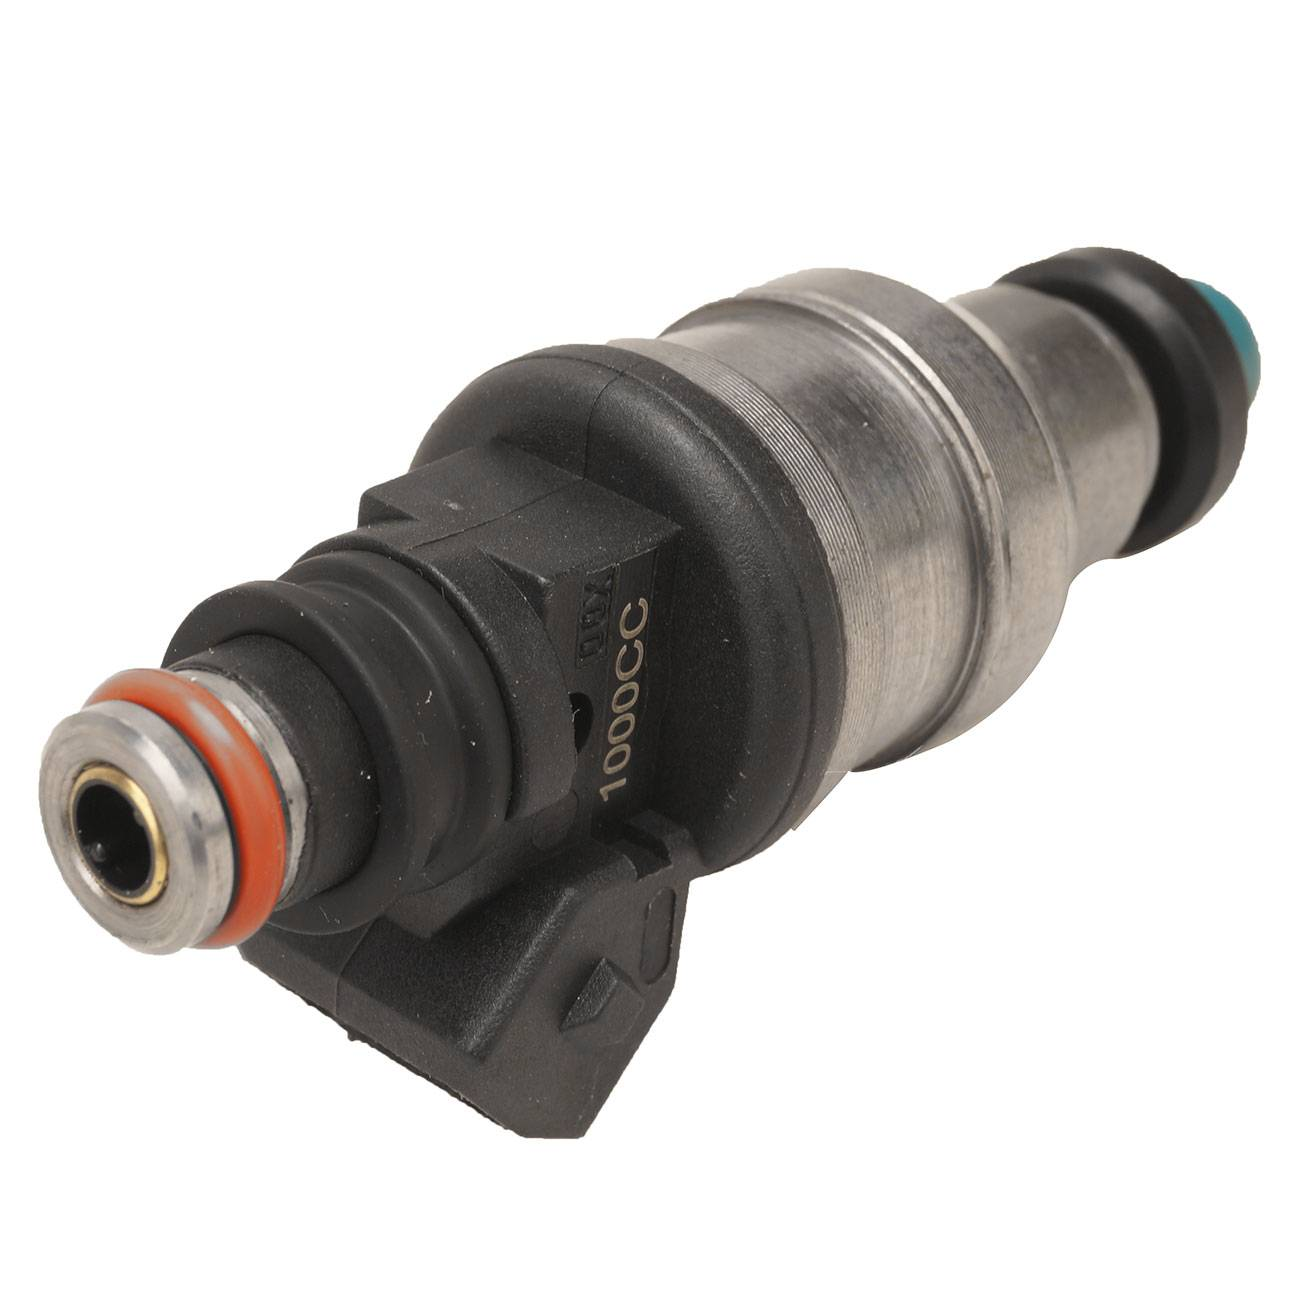 Bapmic 1000cc Fuel Injector Kit for Honda B16 B18 B20 D16 D18 F22 H22 H22A  VTEC (Pack of 4)